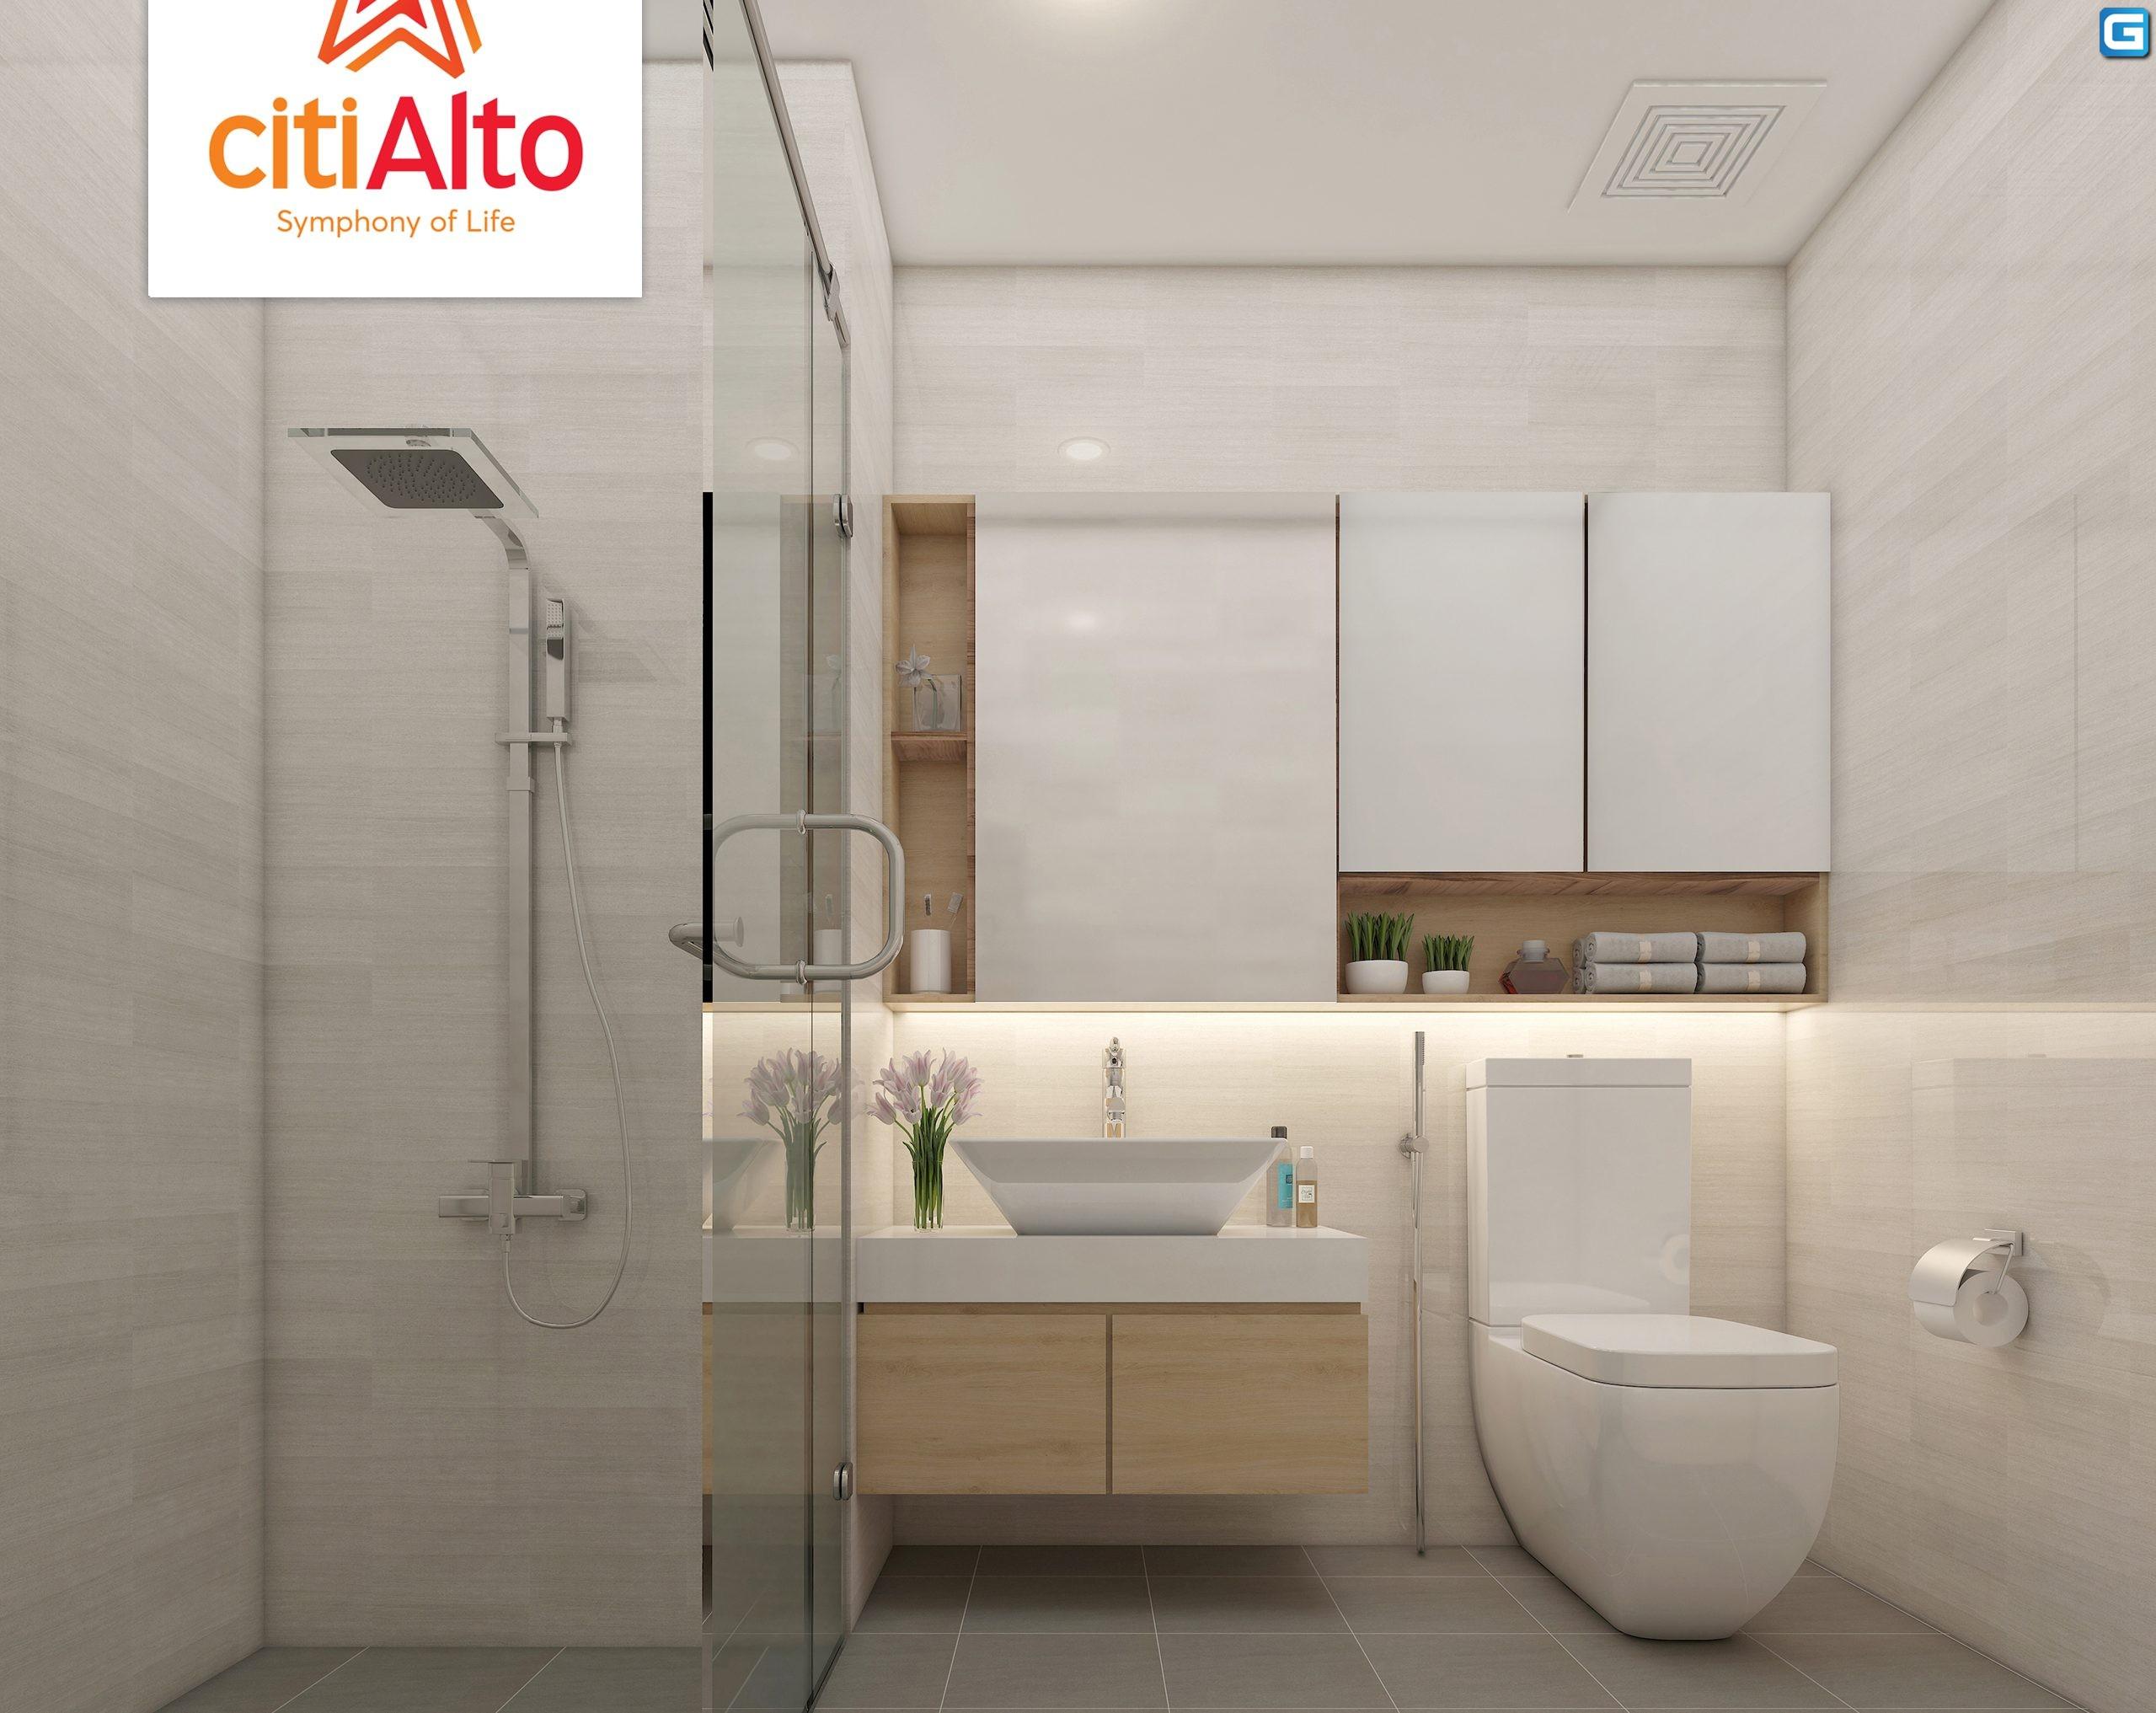 dự án căn hộ CitiAlto Quận 2